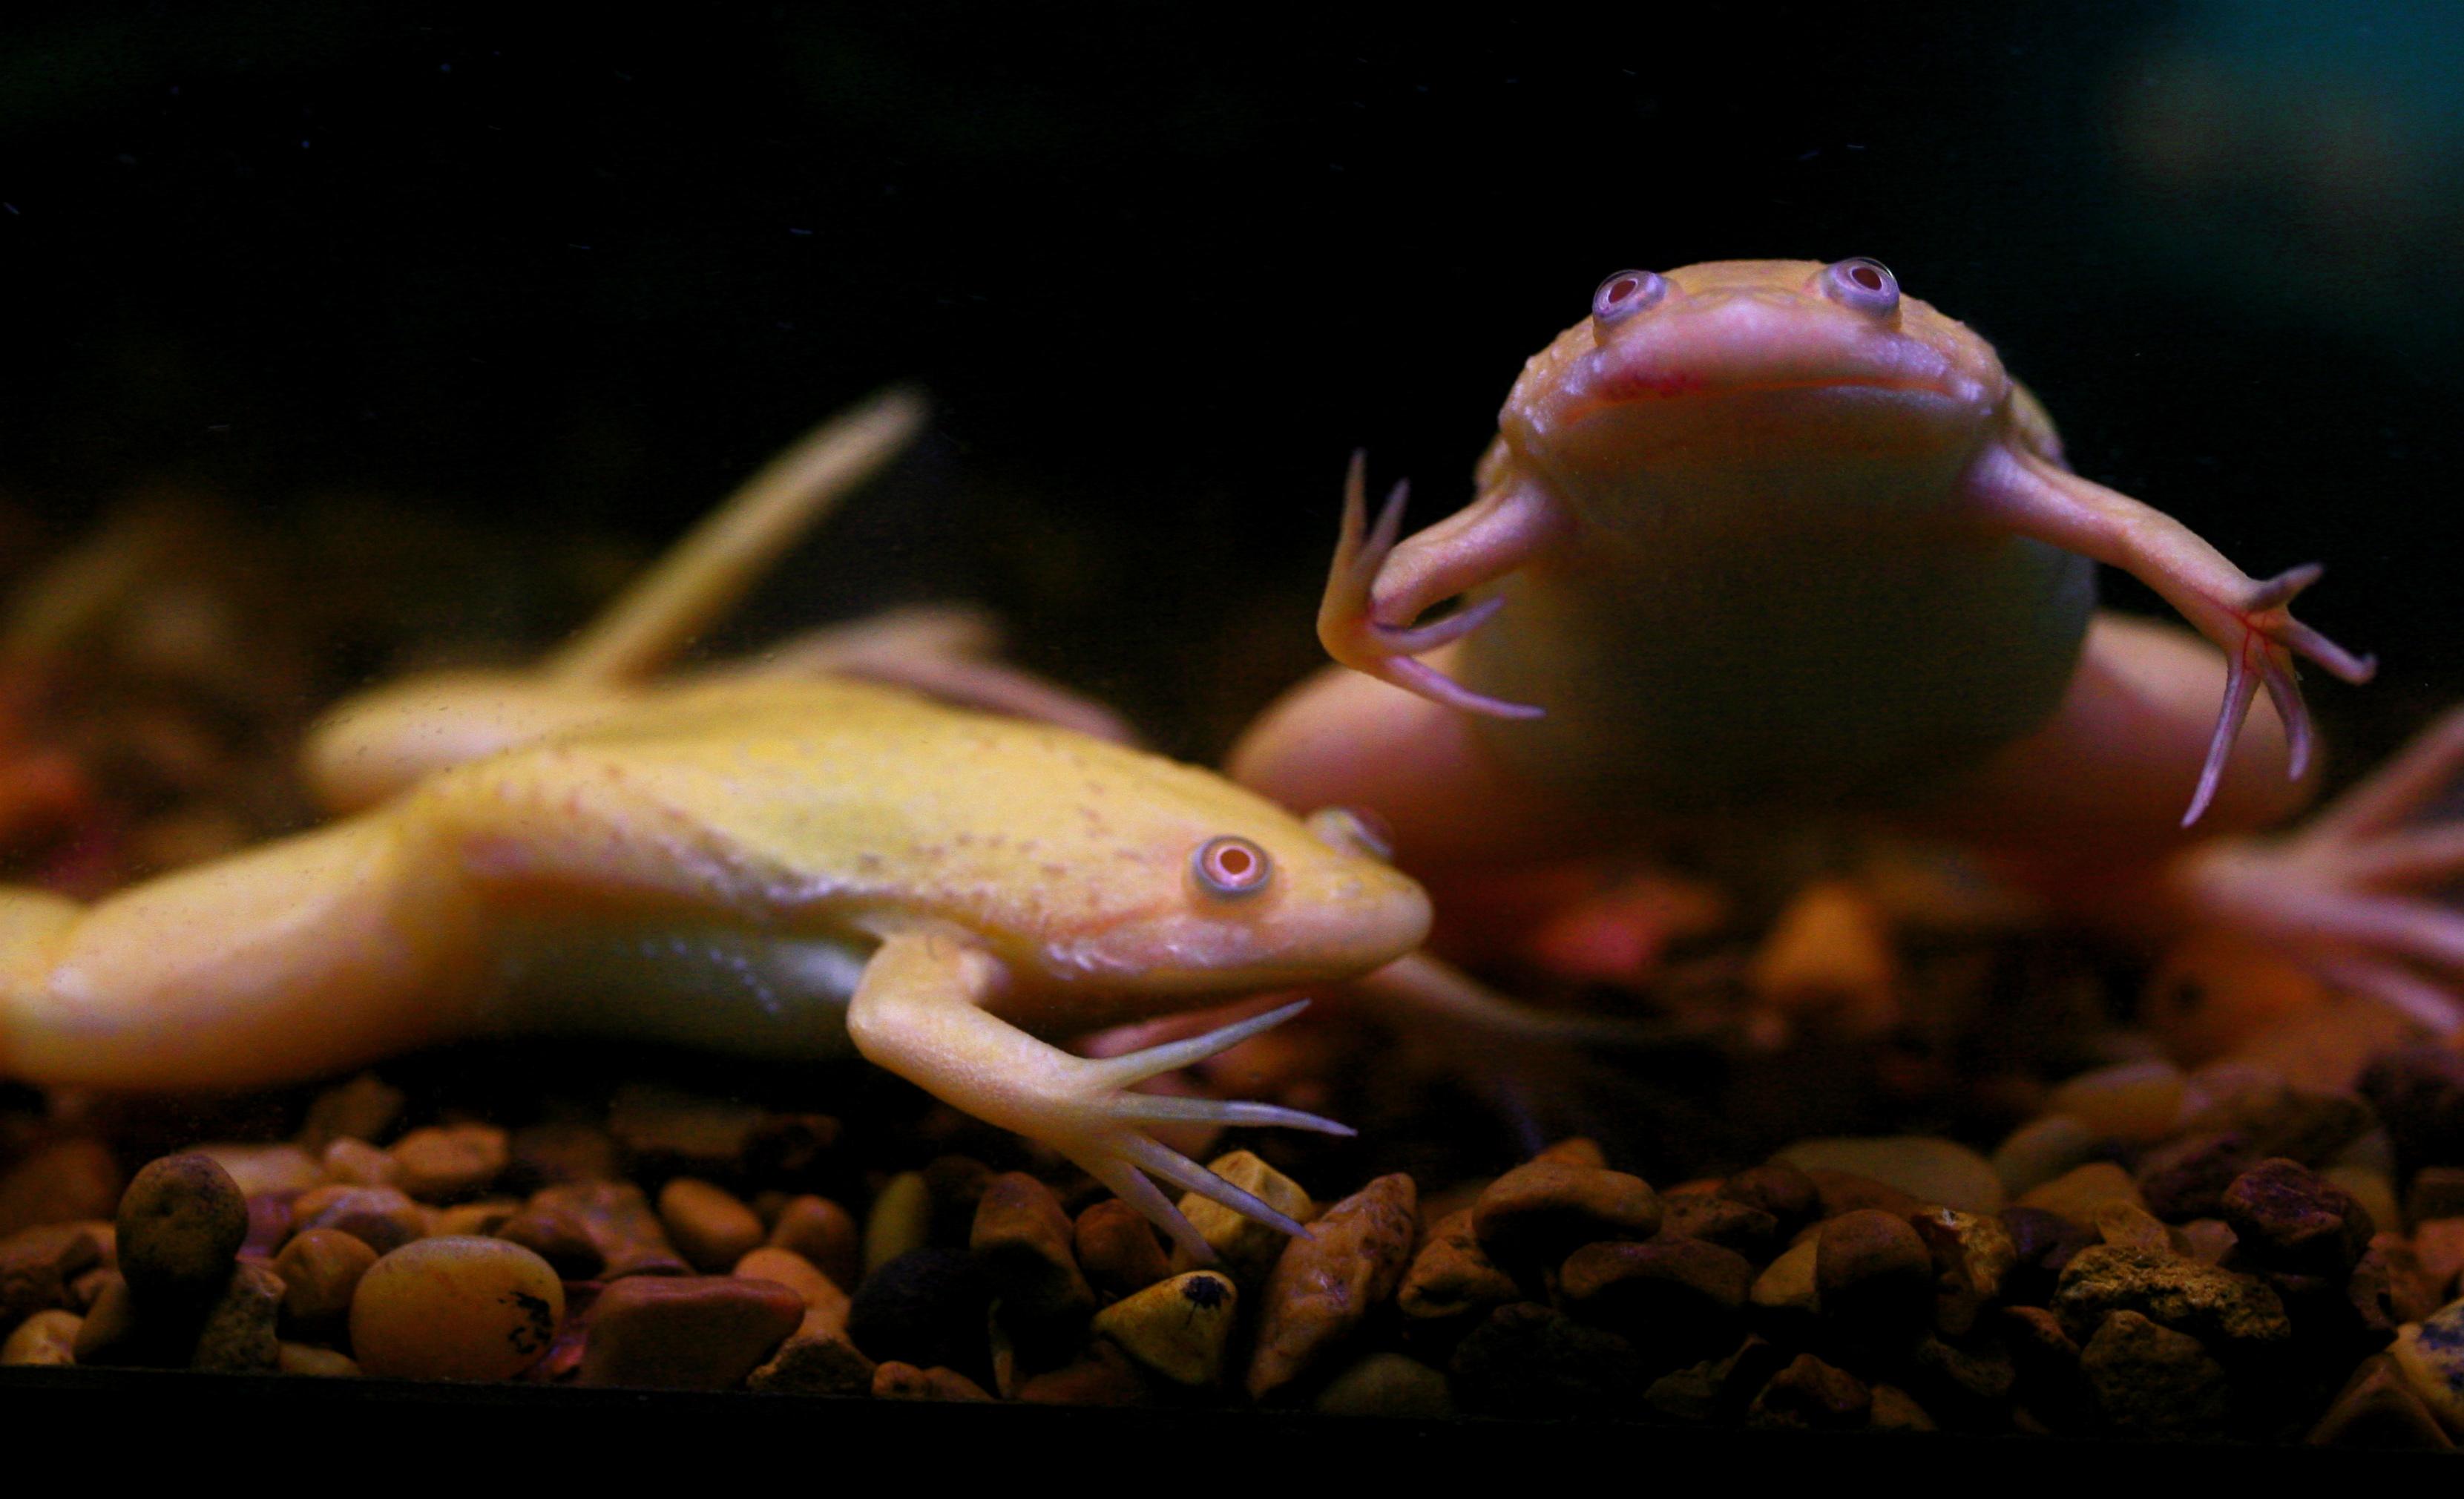 syngenta grenouille